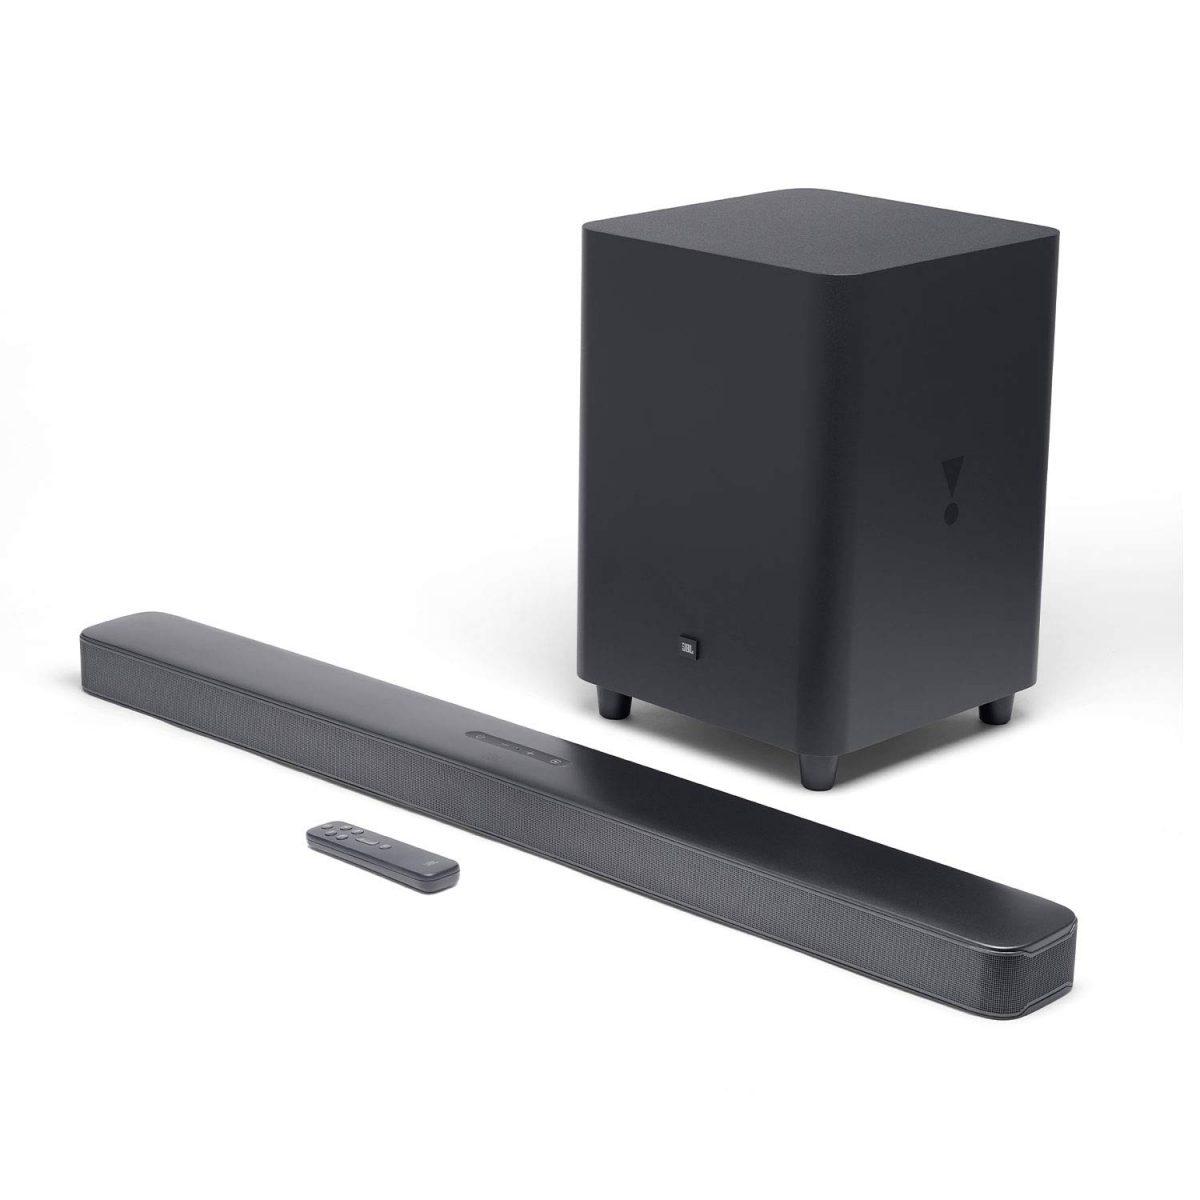 JBL Bar 5.1 Channel Soundbar with Ultra HD 4K